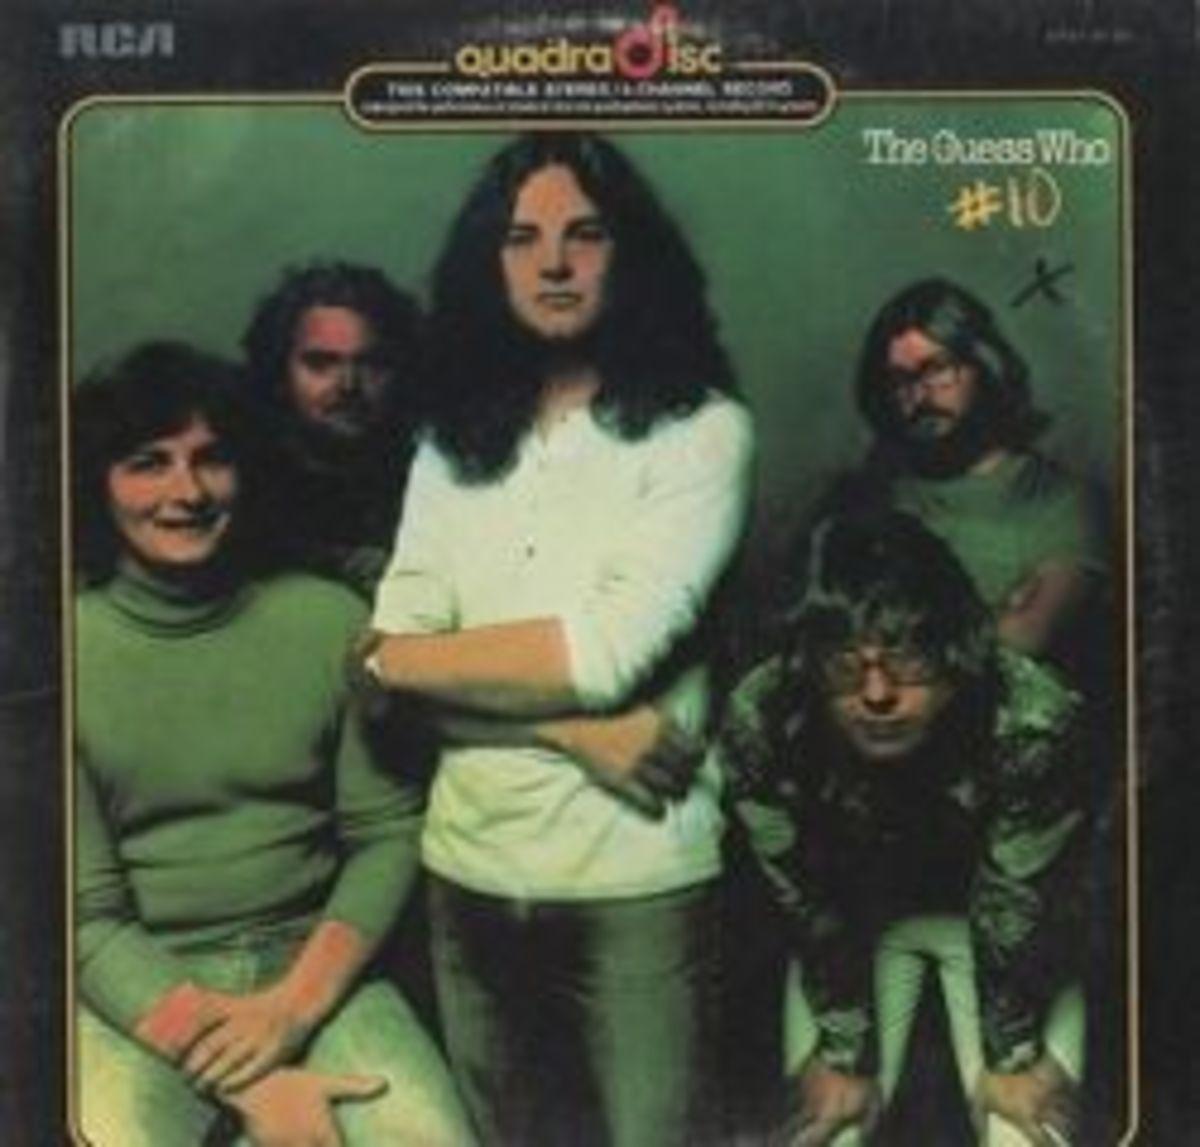 The Guess Who #10 RCA APO1-0130 Quadraphonic Stereo 4 Channel Quad Stereo LP Vinyl Record